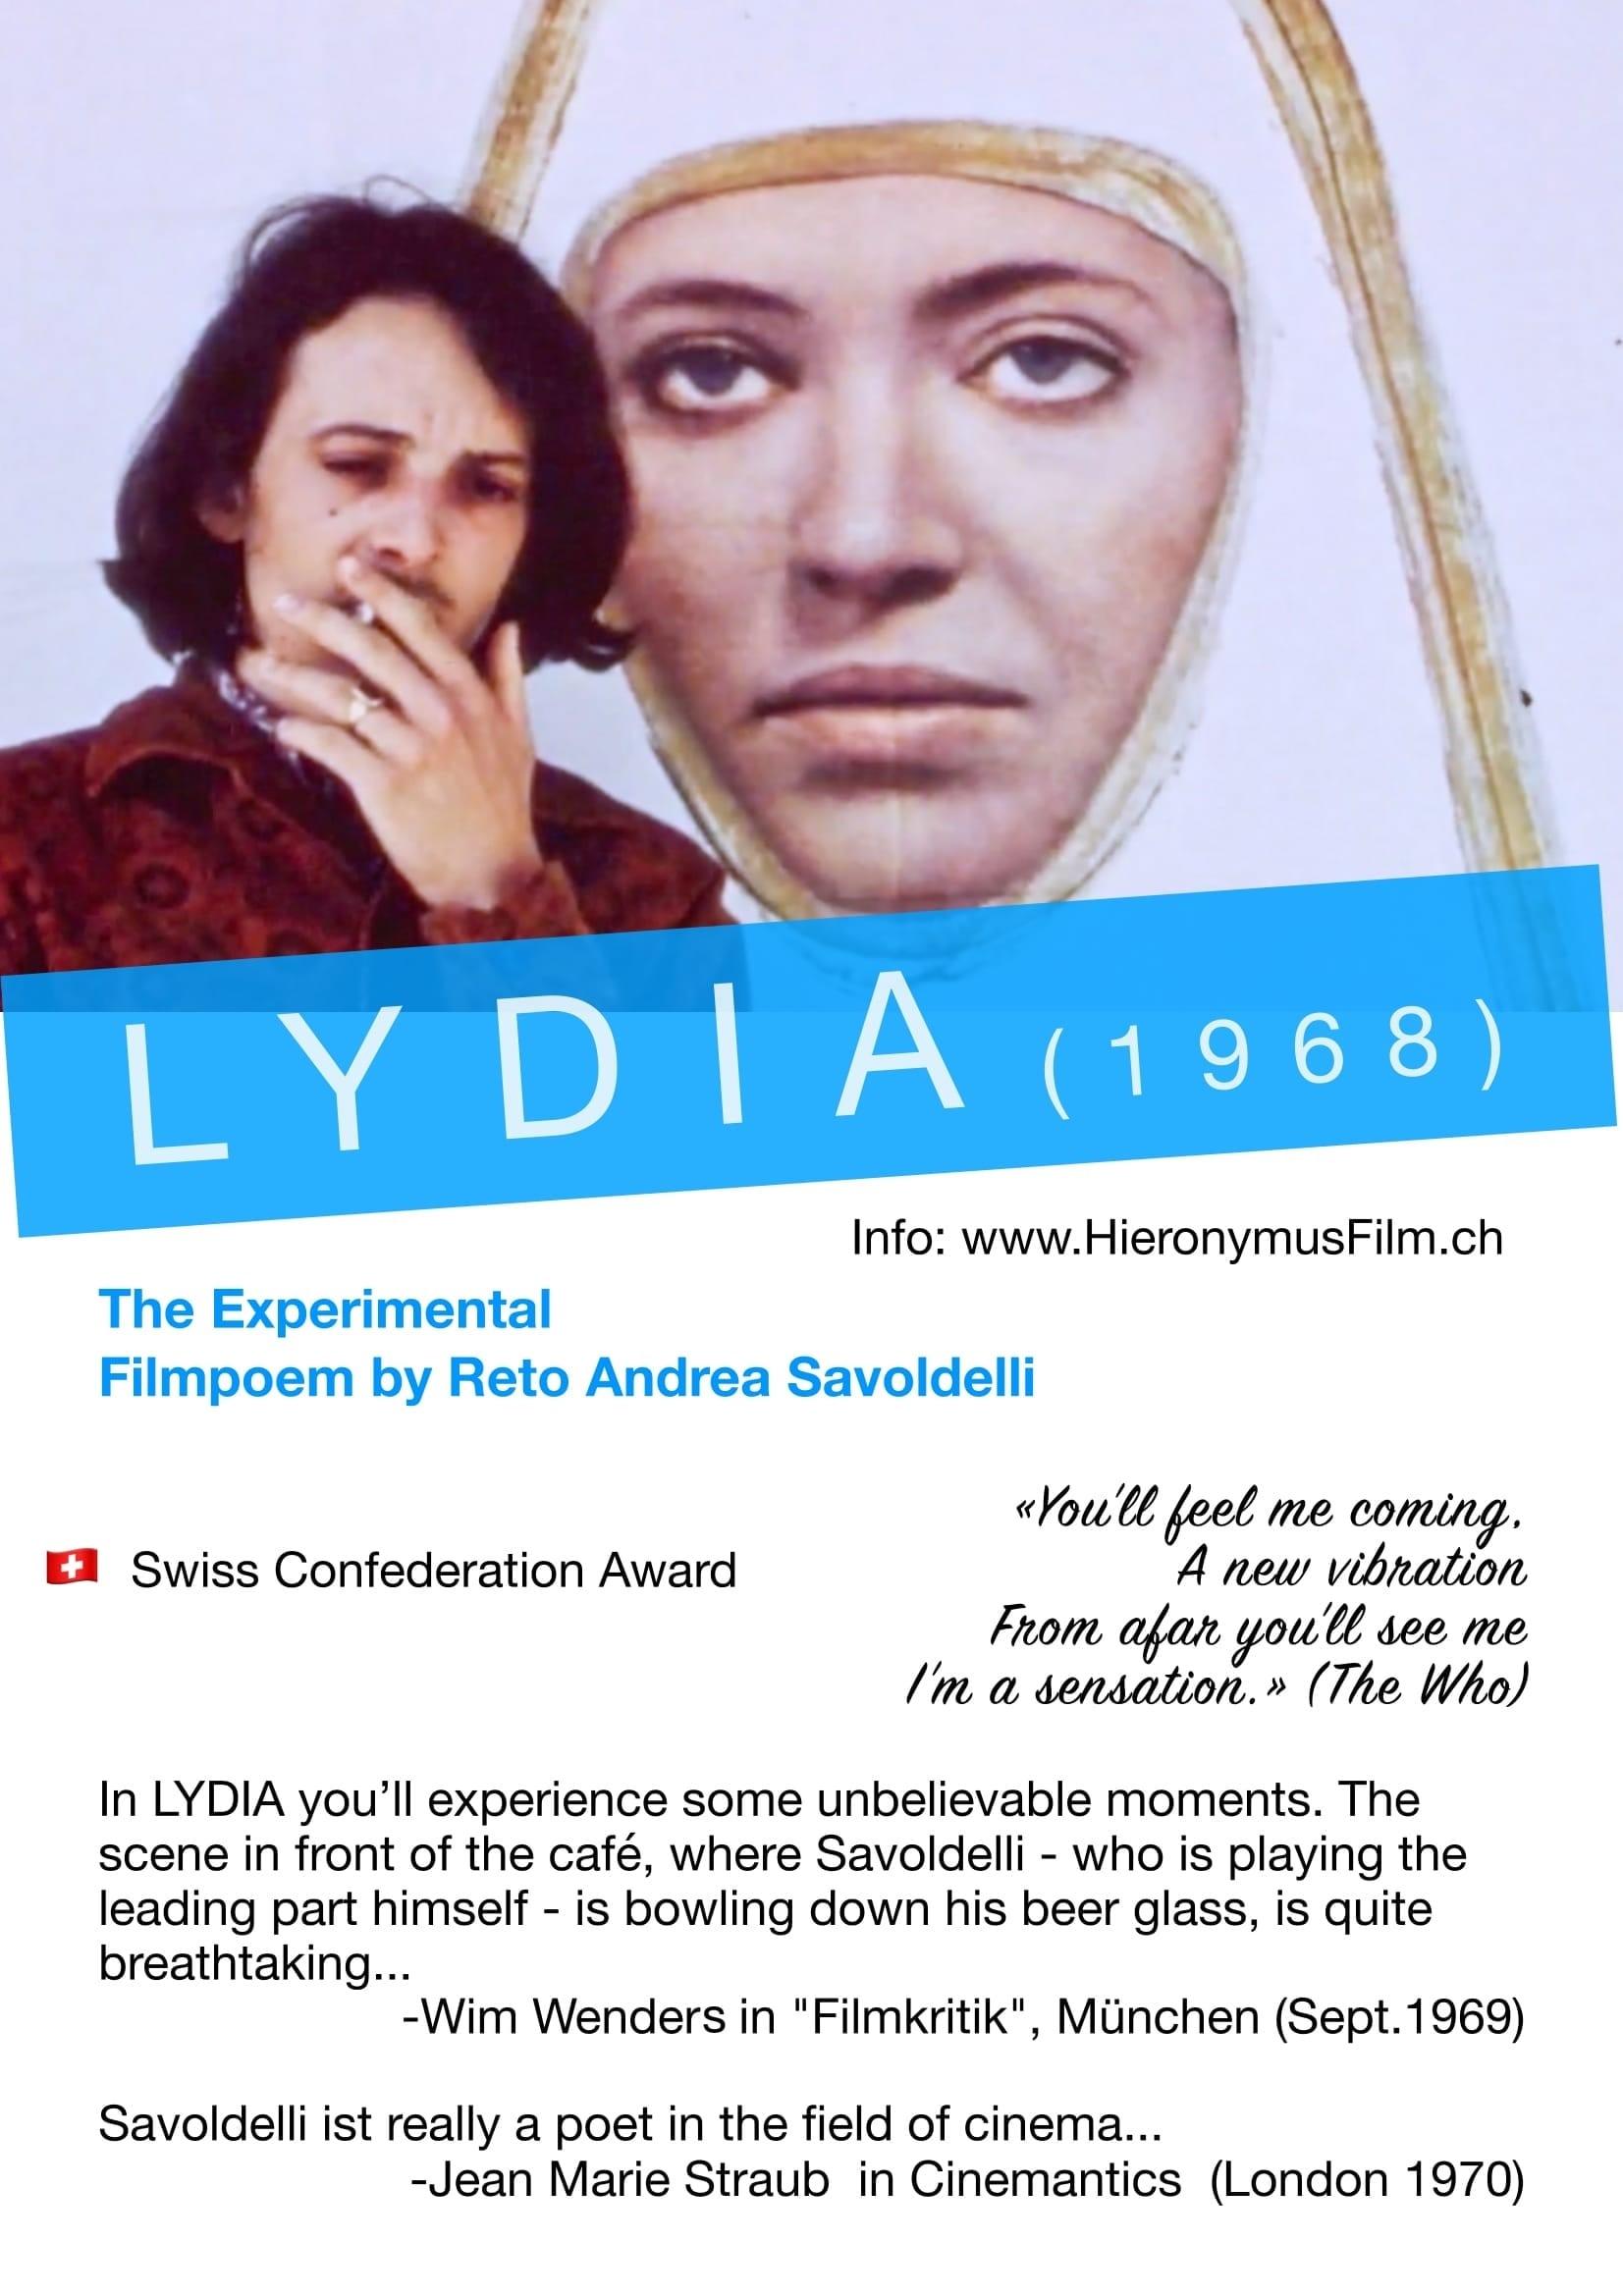 Lydia (1968)